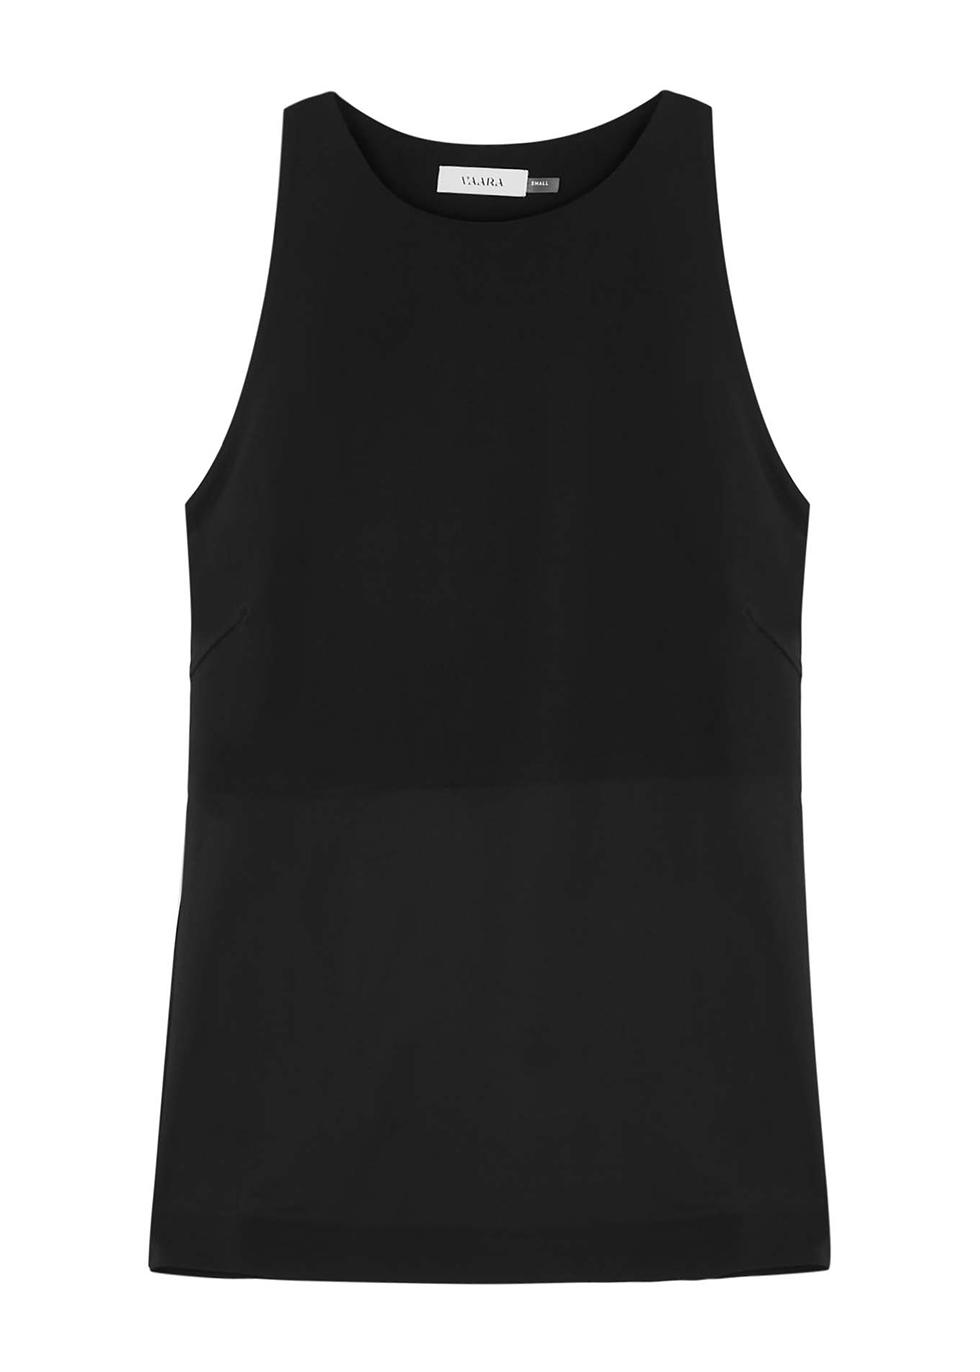 Bettina black stretch-jersey top